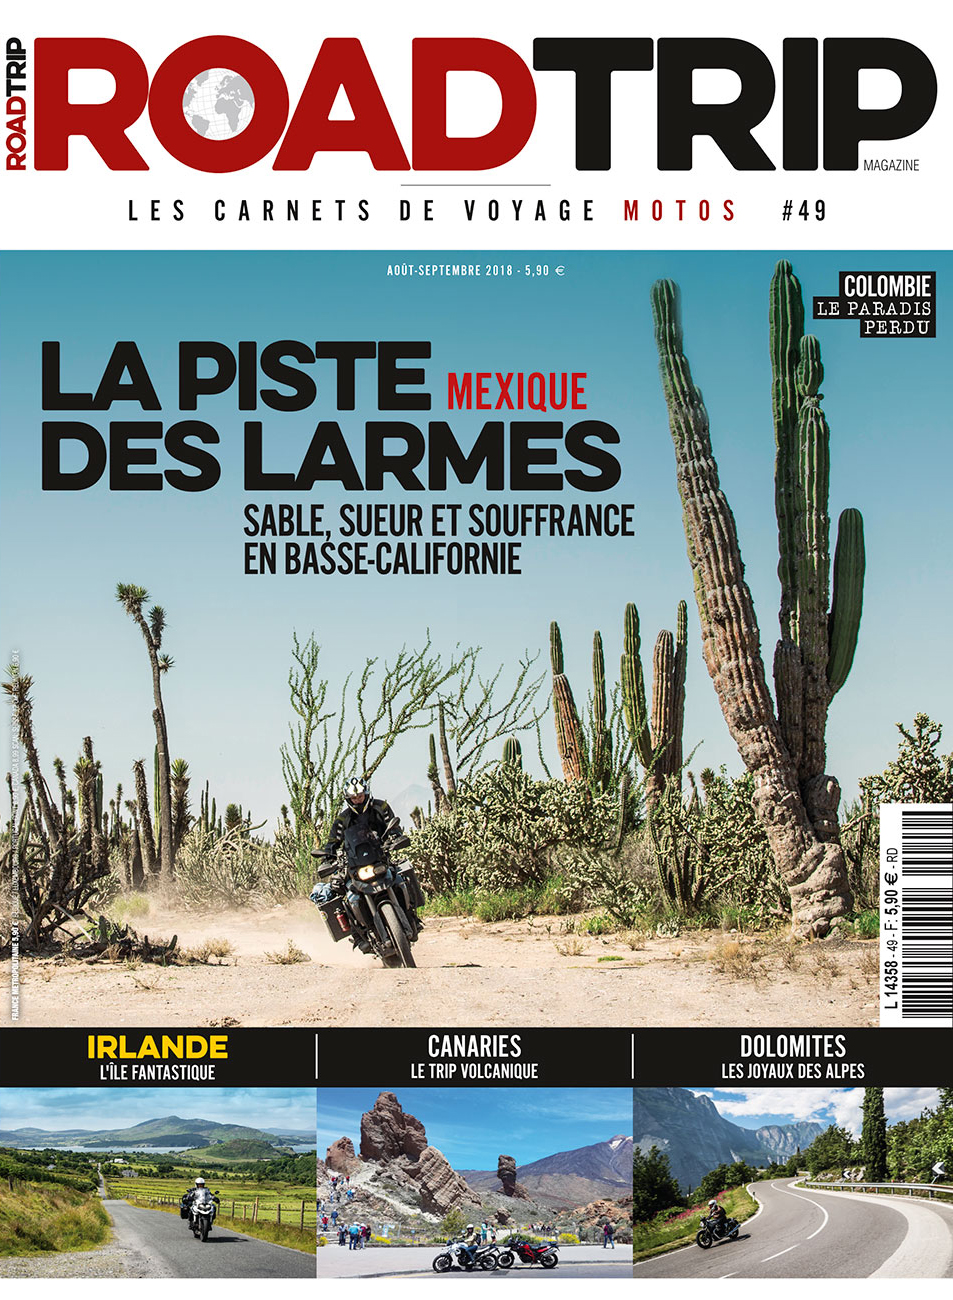 Couv Road trip mag #49 Madagascar et Colombie